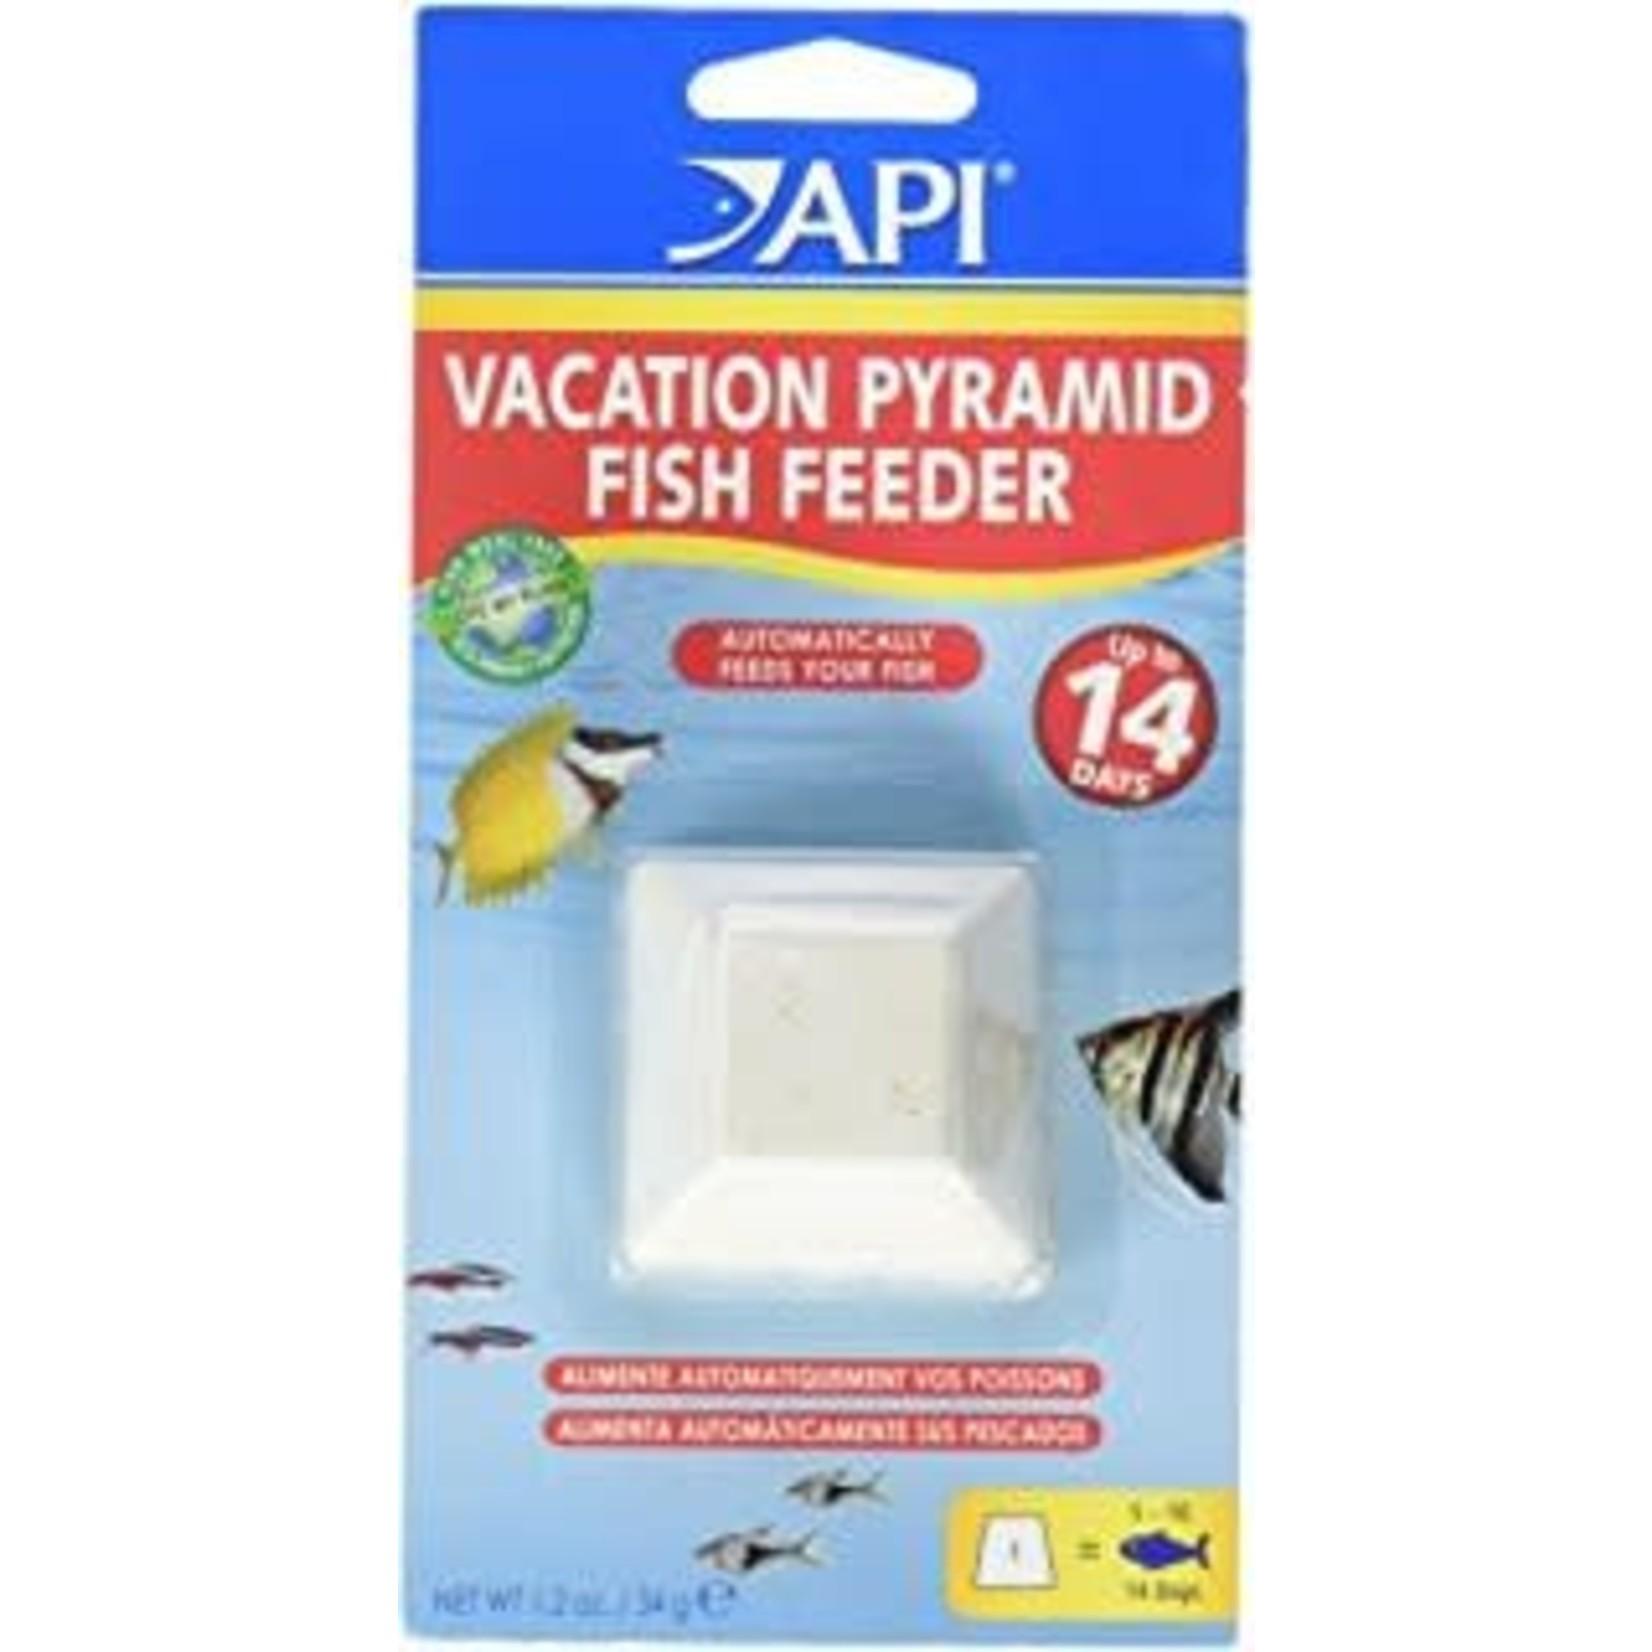 API PYRAMID 7-DAY Feeder